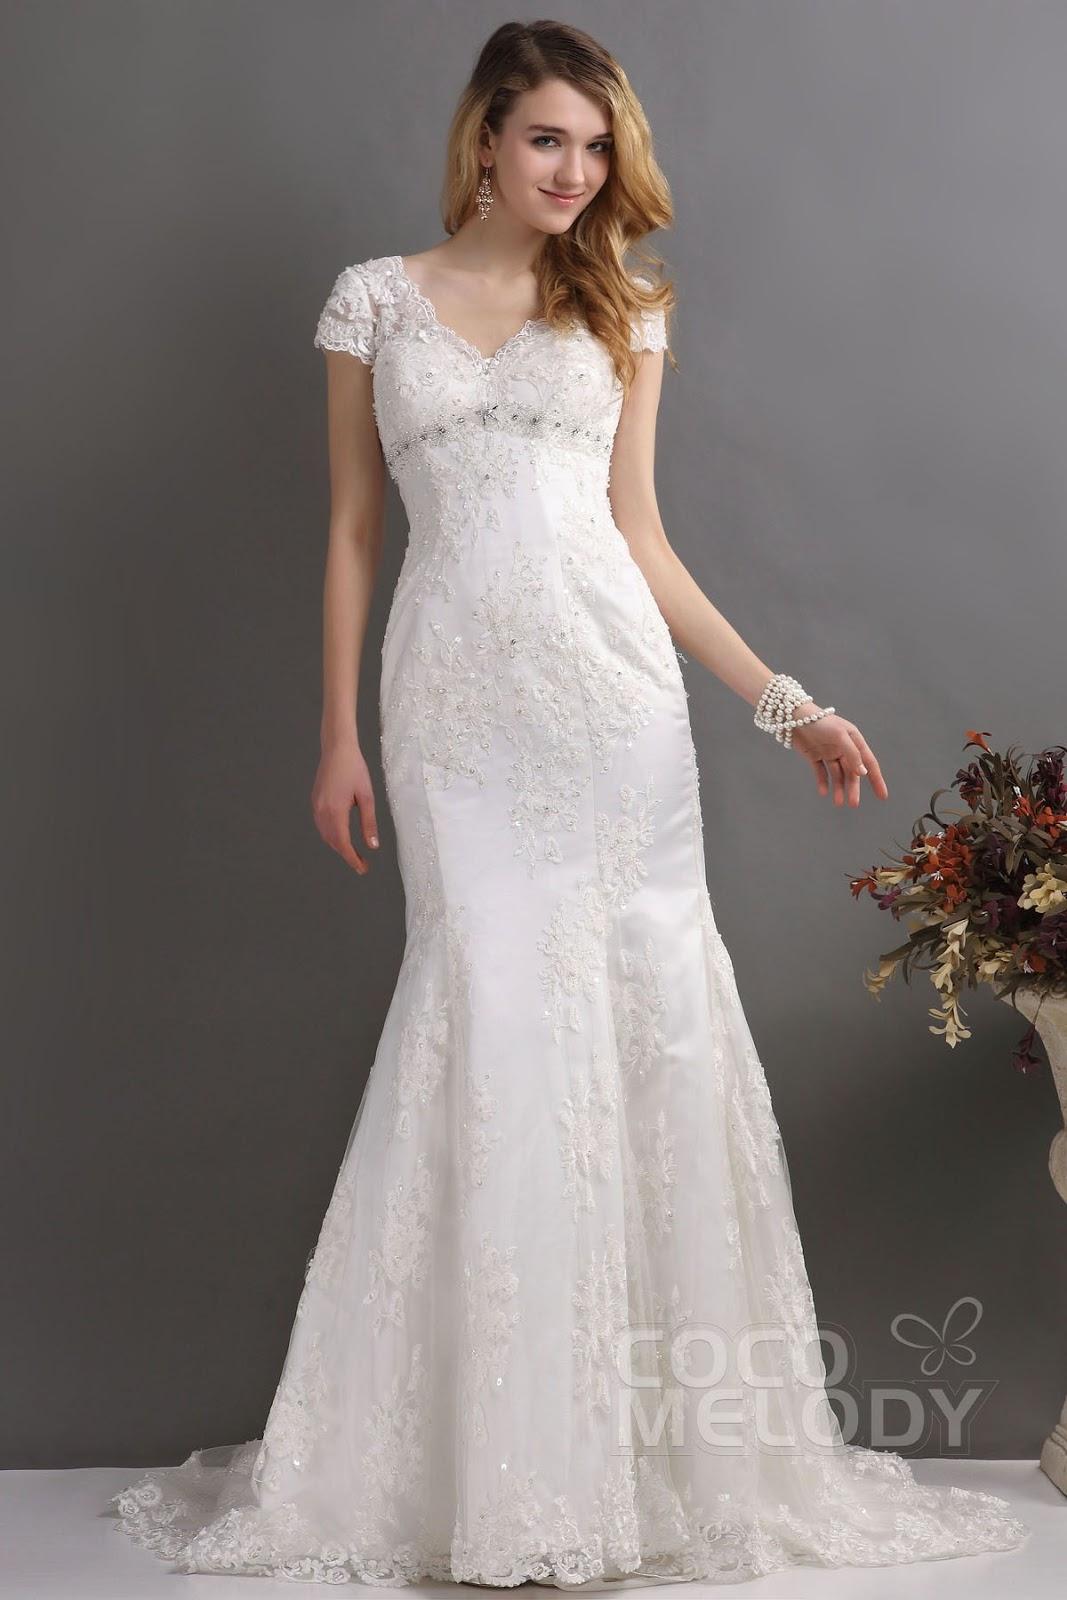 2013 the most beautiful wedding dress: Wide satin bustier wedding ...